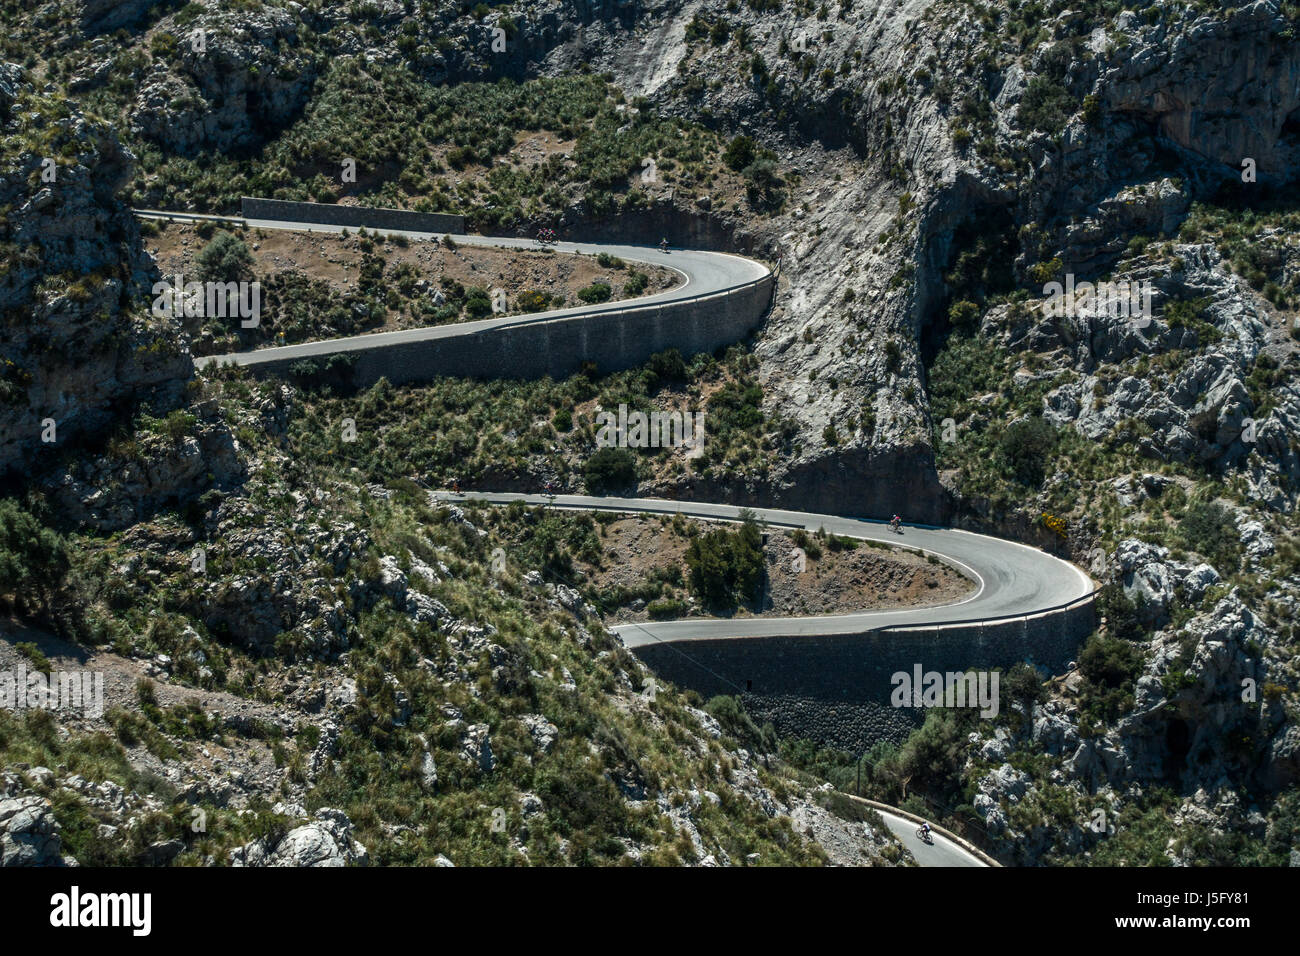 Cyclists on the famous winding road down to the coastal village of Sa Calobra, Mallorca, Majorca, Balearic Islands, - Stock Image